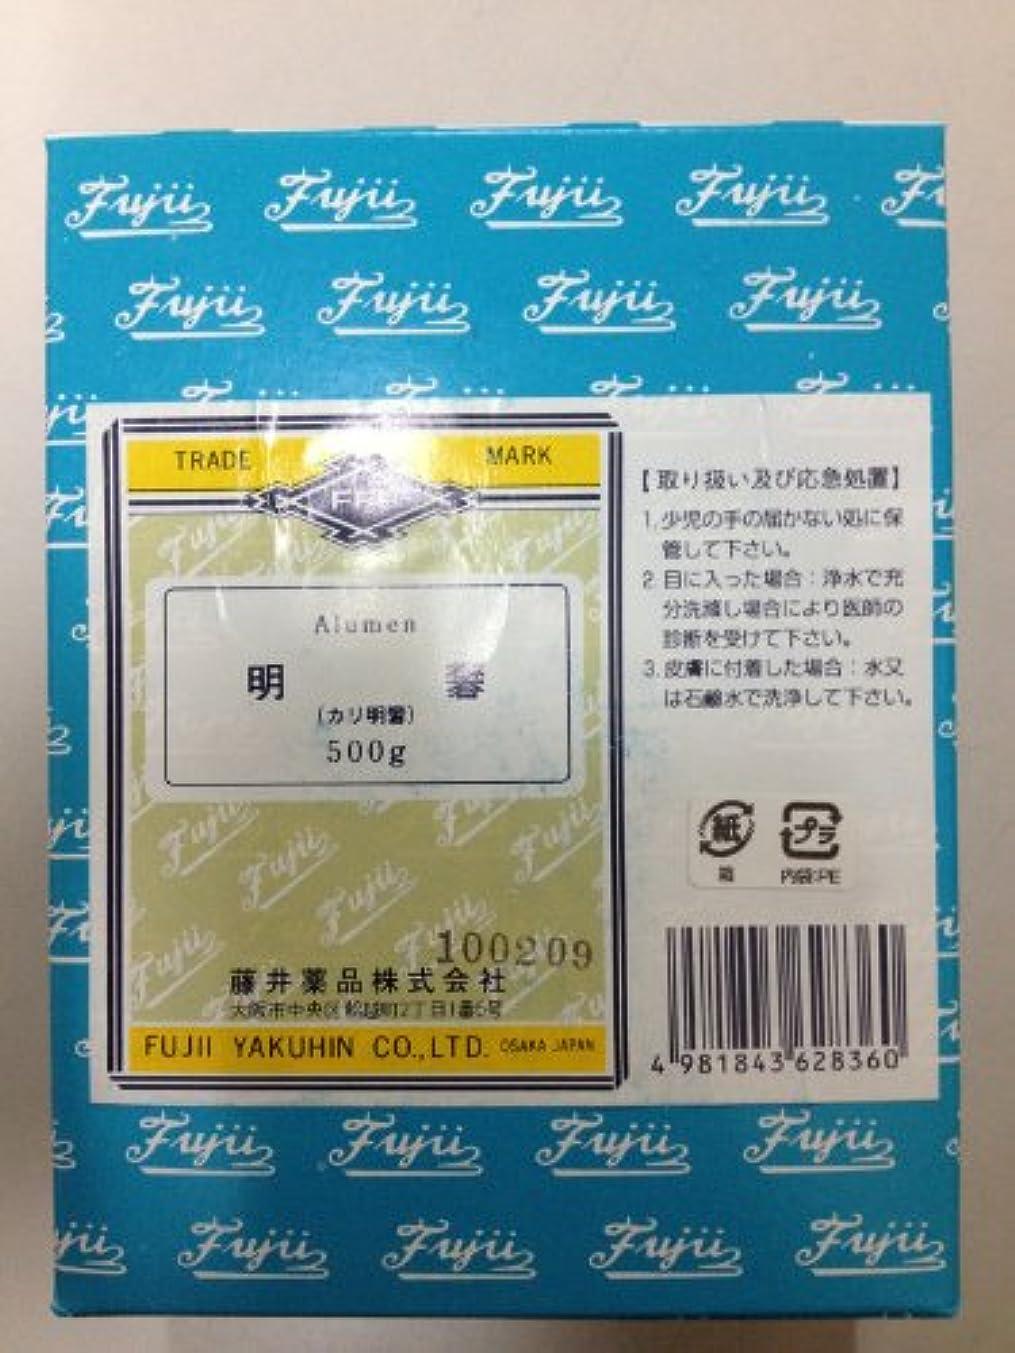 仲間、同僚買い手粘液カリ明礬500g 藤井薬品